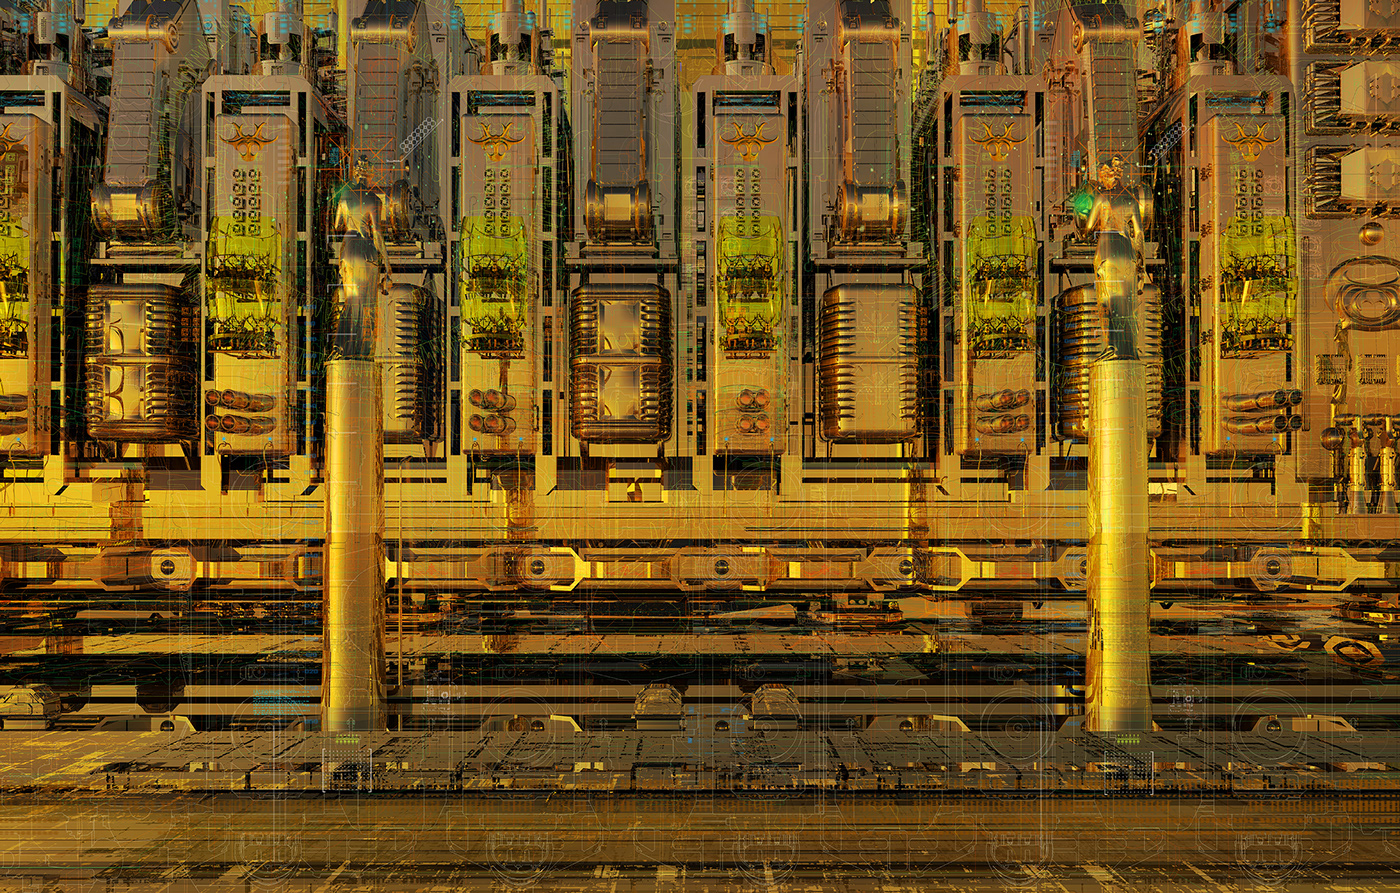 The Journey eternal machine non-machine hidint tears speculative architecture machine architecture remote machine remote-controlled phantastic architecture